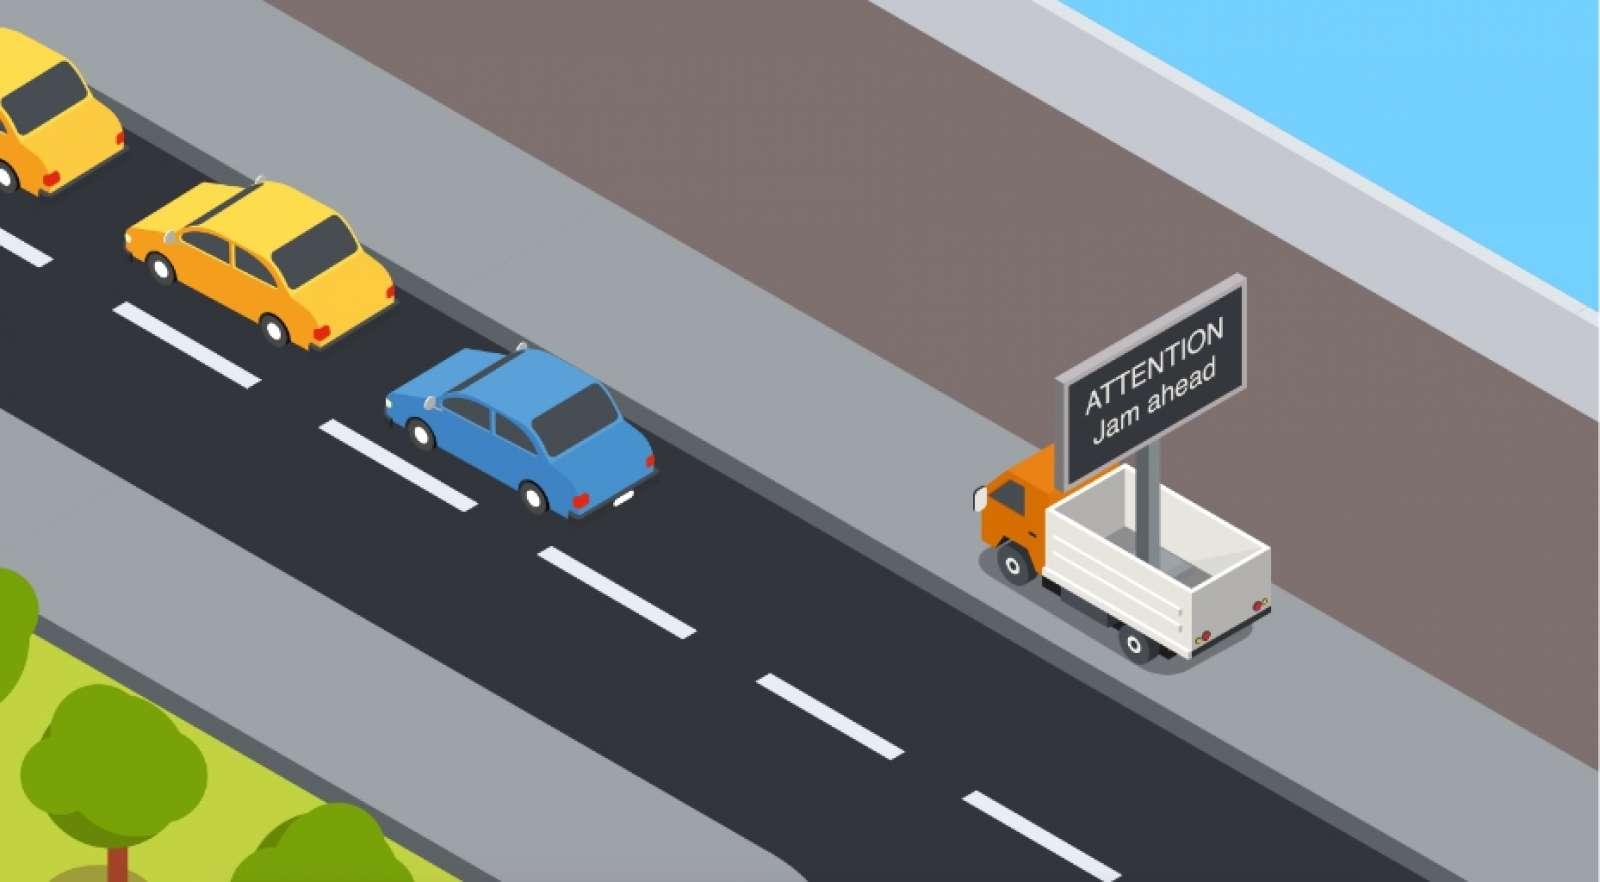 Traffic parking guidance 1